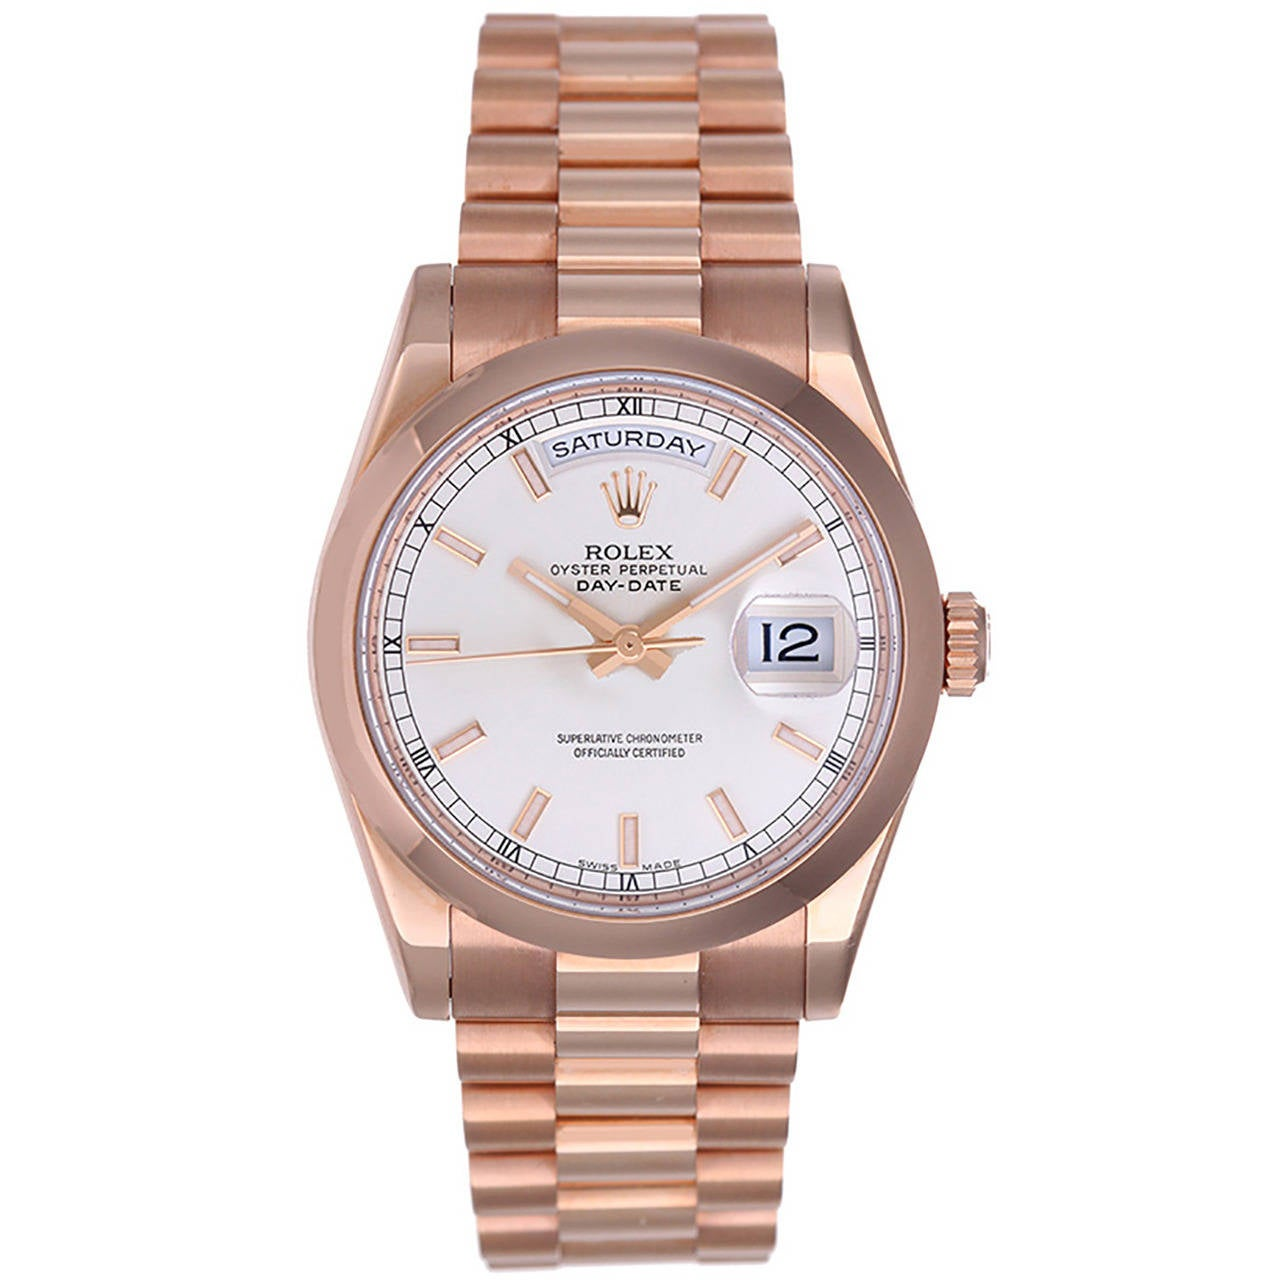 Rolex Rose Gold President Day-Date Wristwatch Ref 118205